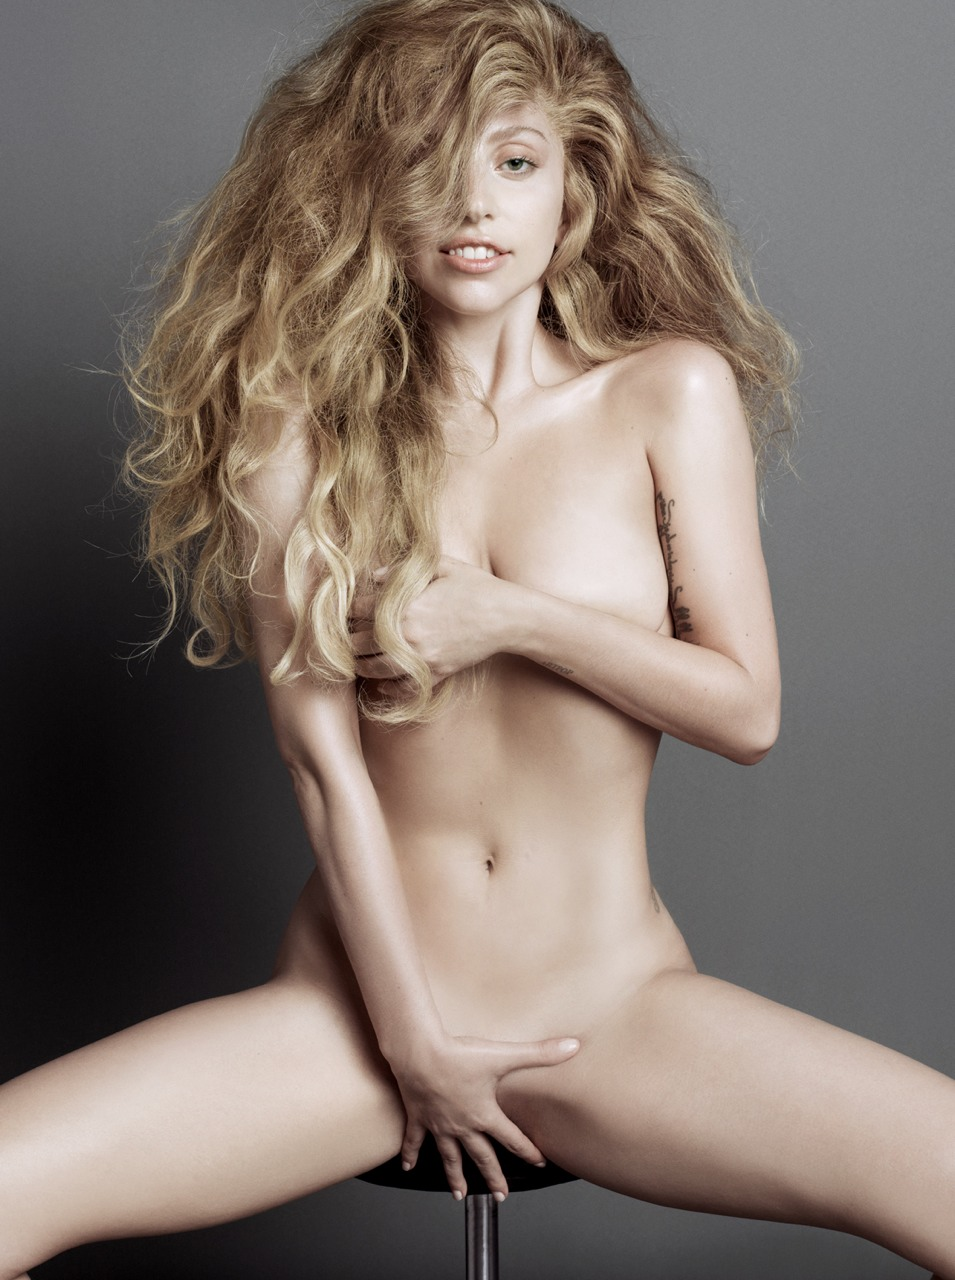 Naked Celebrities